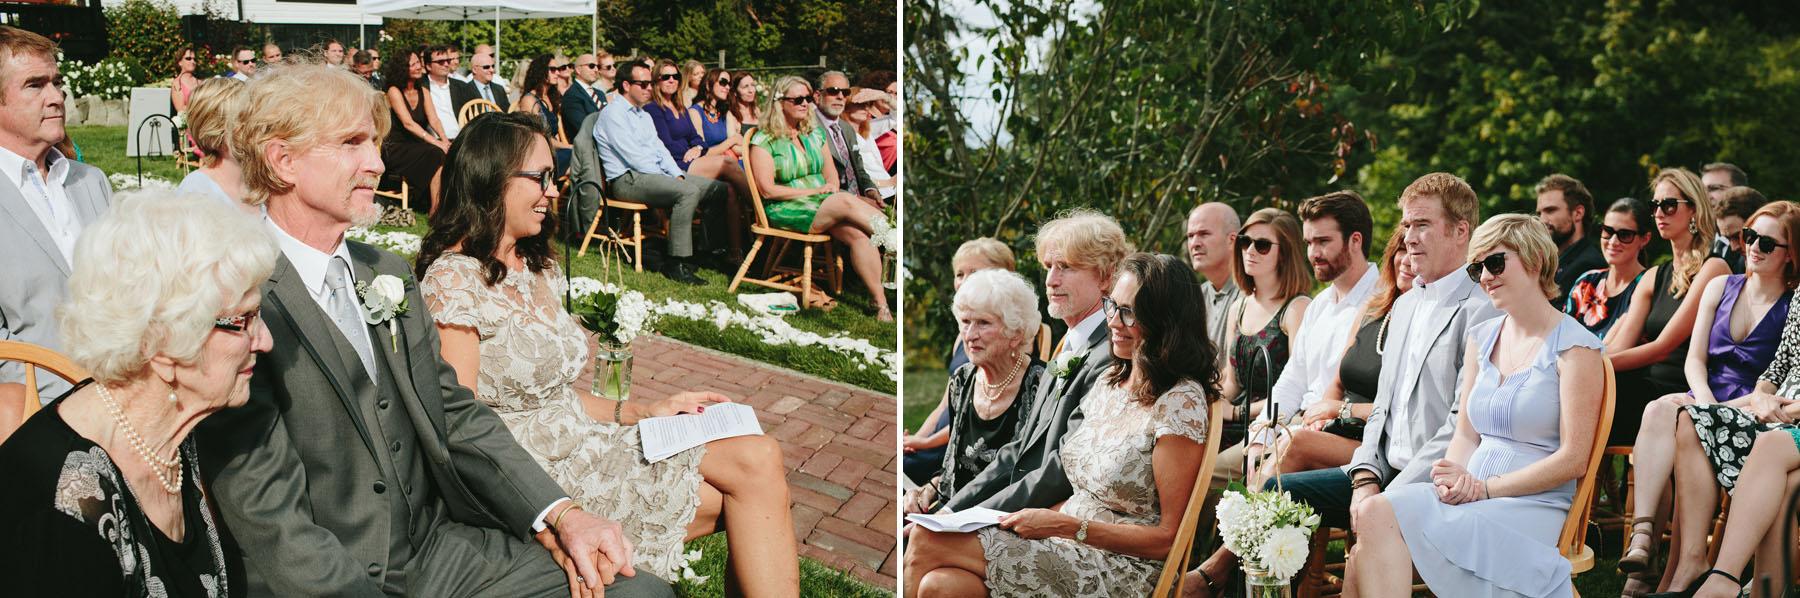 thetis-island-wedding-photographer-rp-rn-088.jpg